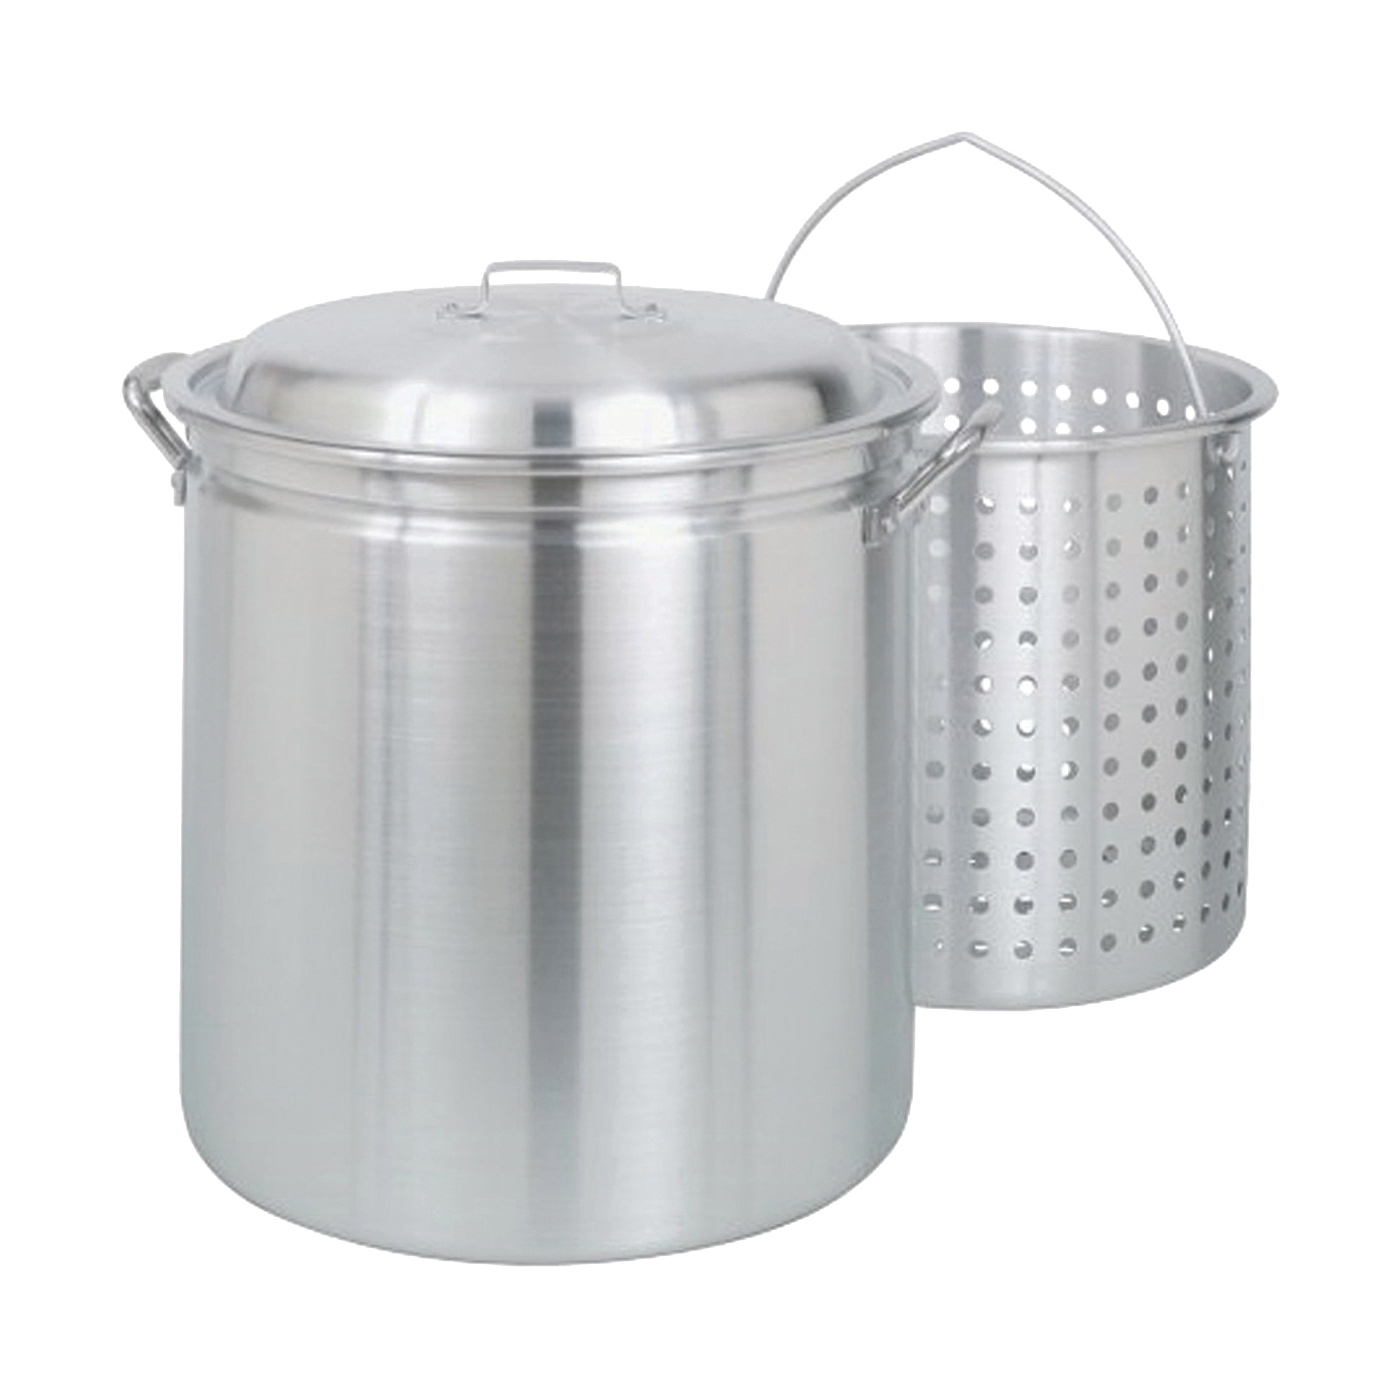 Picture of Bayou Classic 4060 Stock Pot, 60 qt Capacity, Aluminum